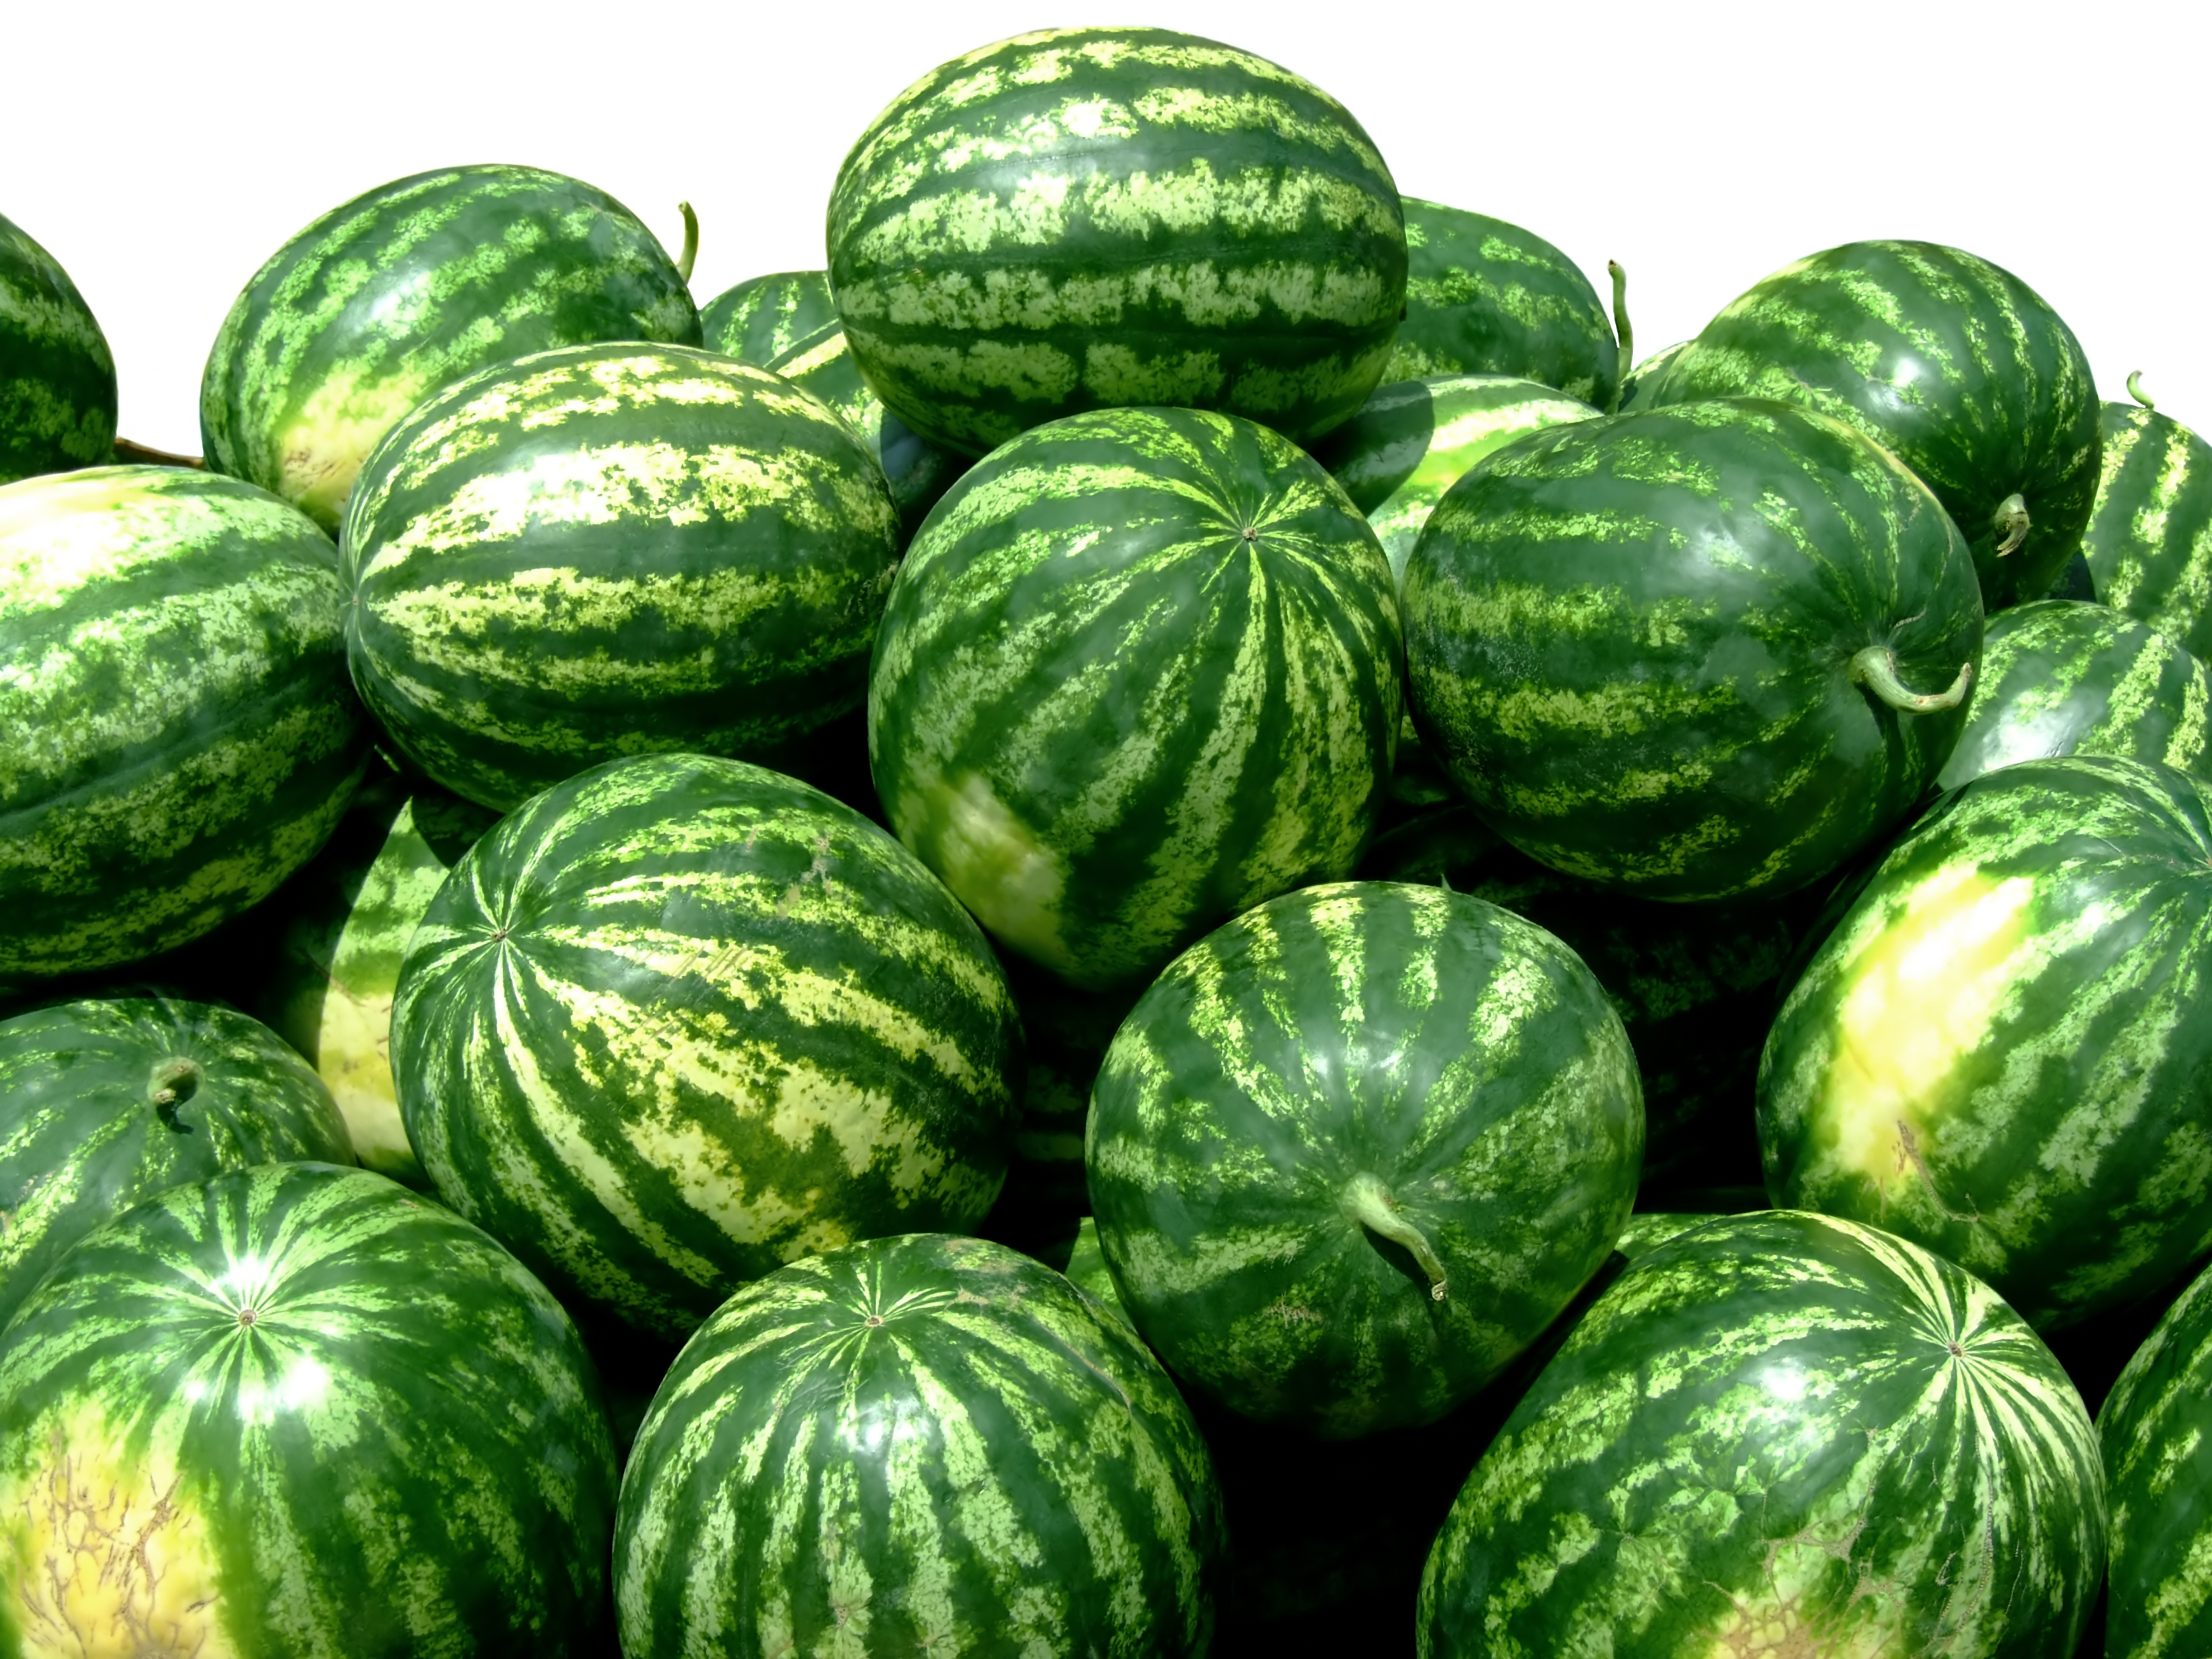 watermelon bunch